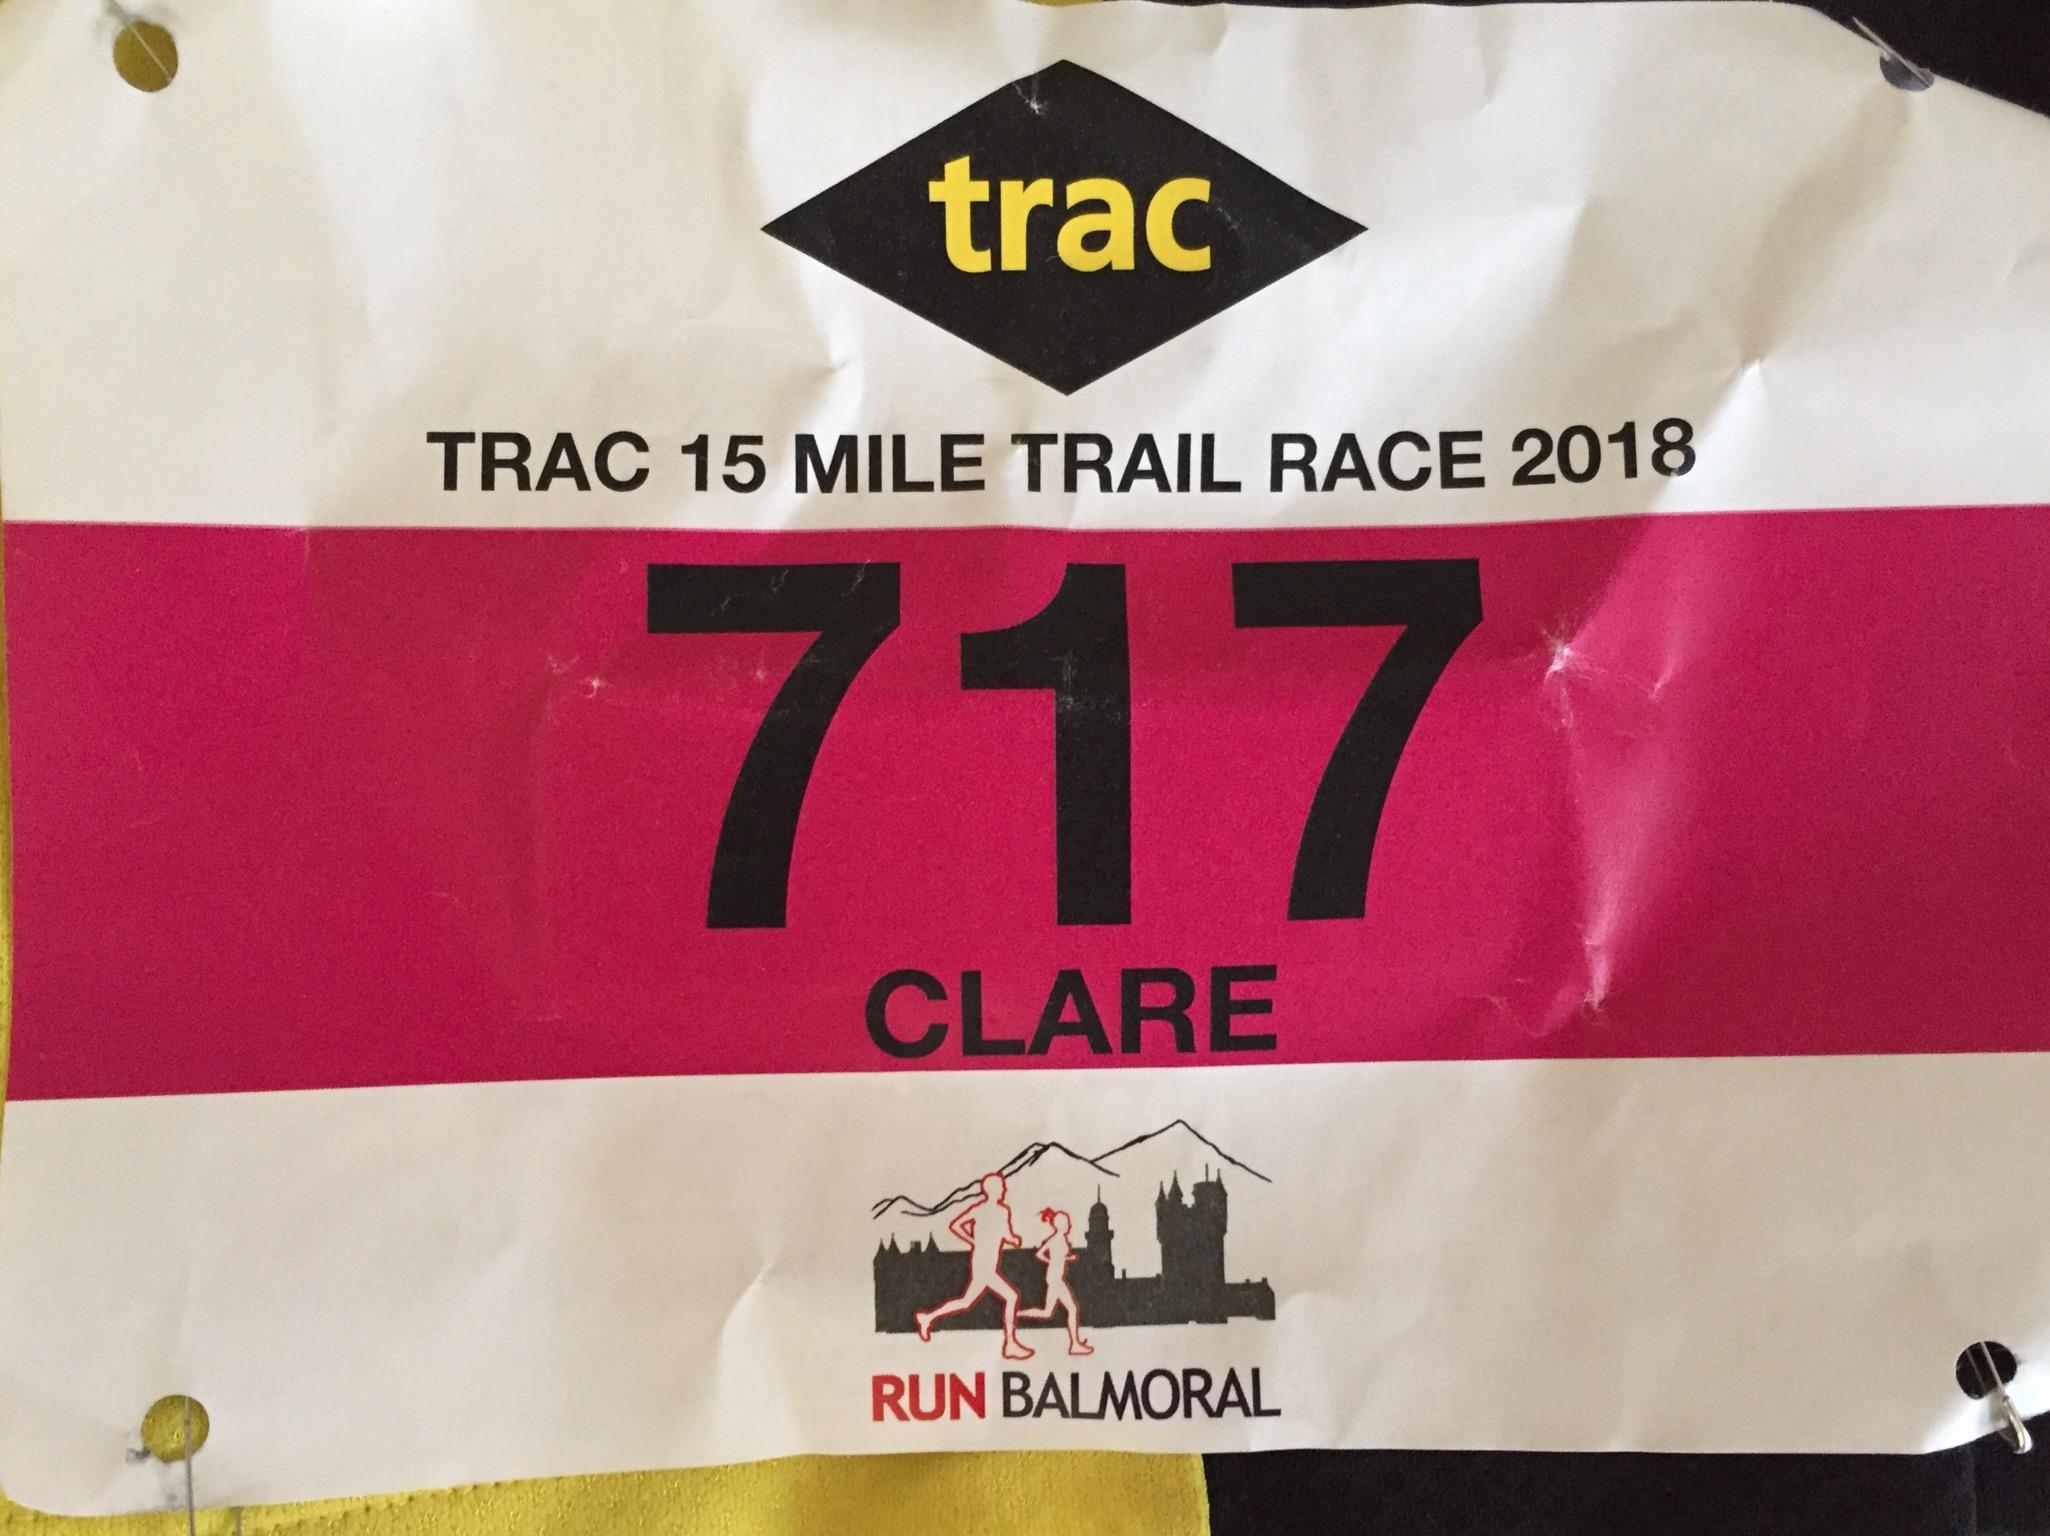 Trac 15 Mile Trail Race, Run Balmoral